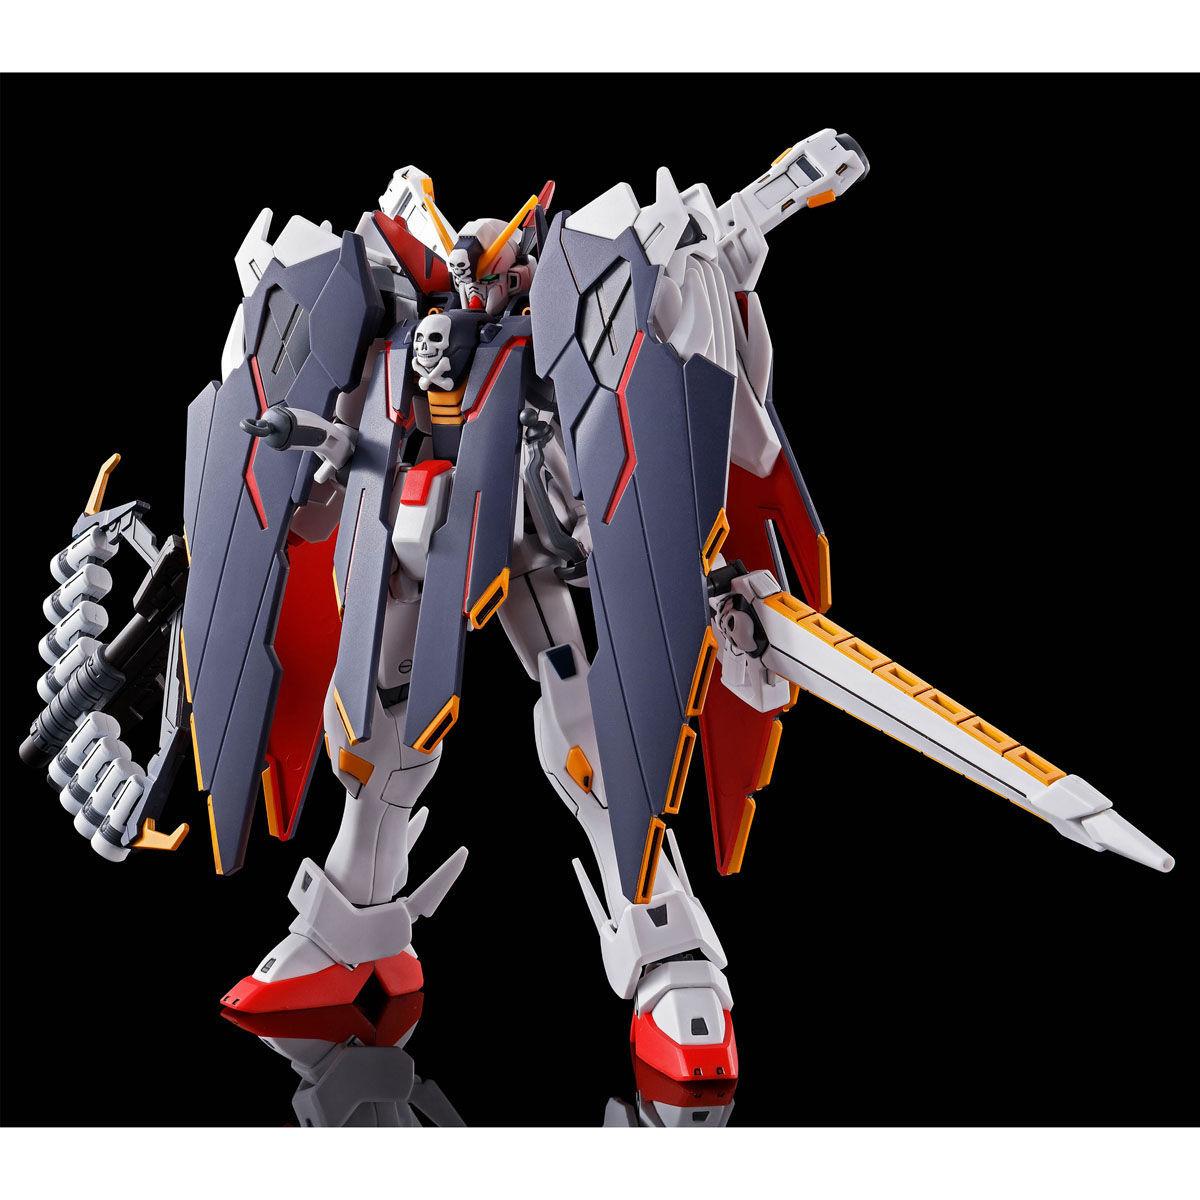 HG クロスボーン・ガンダムX1フルクロス04